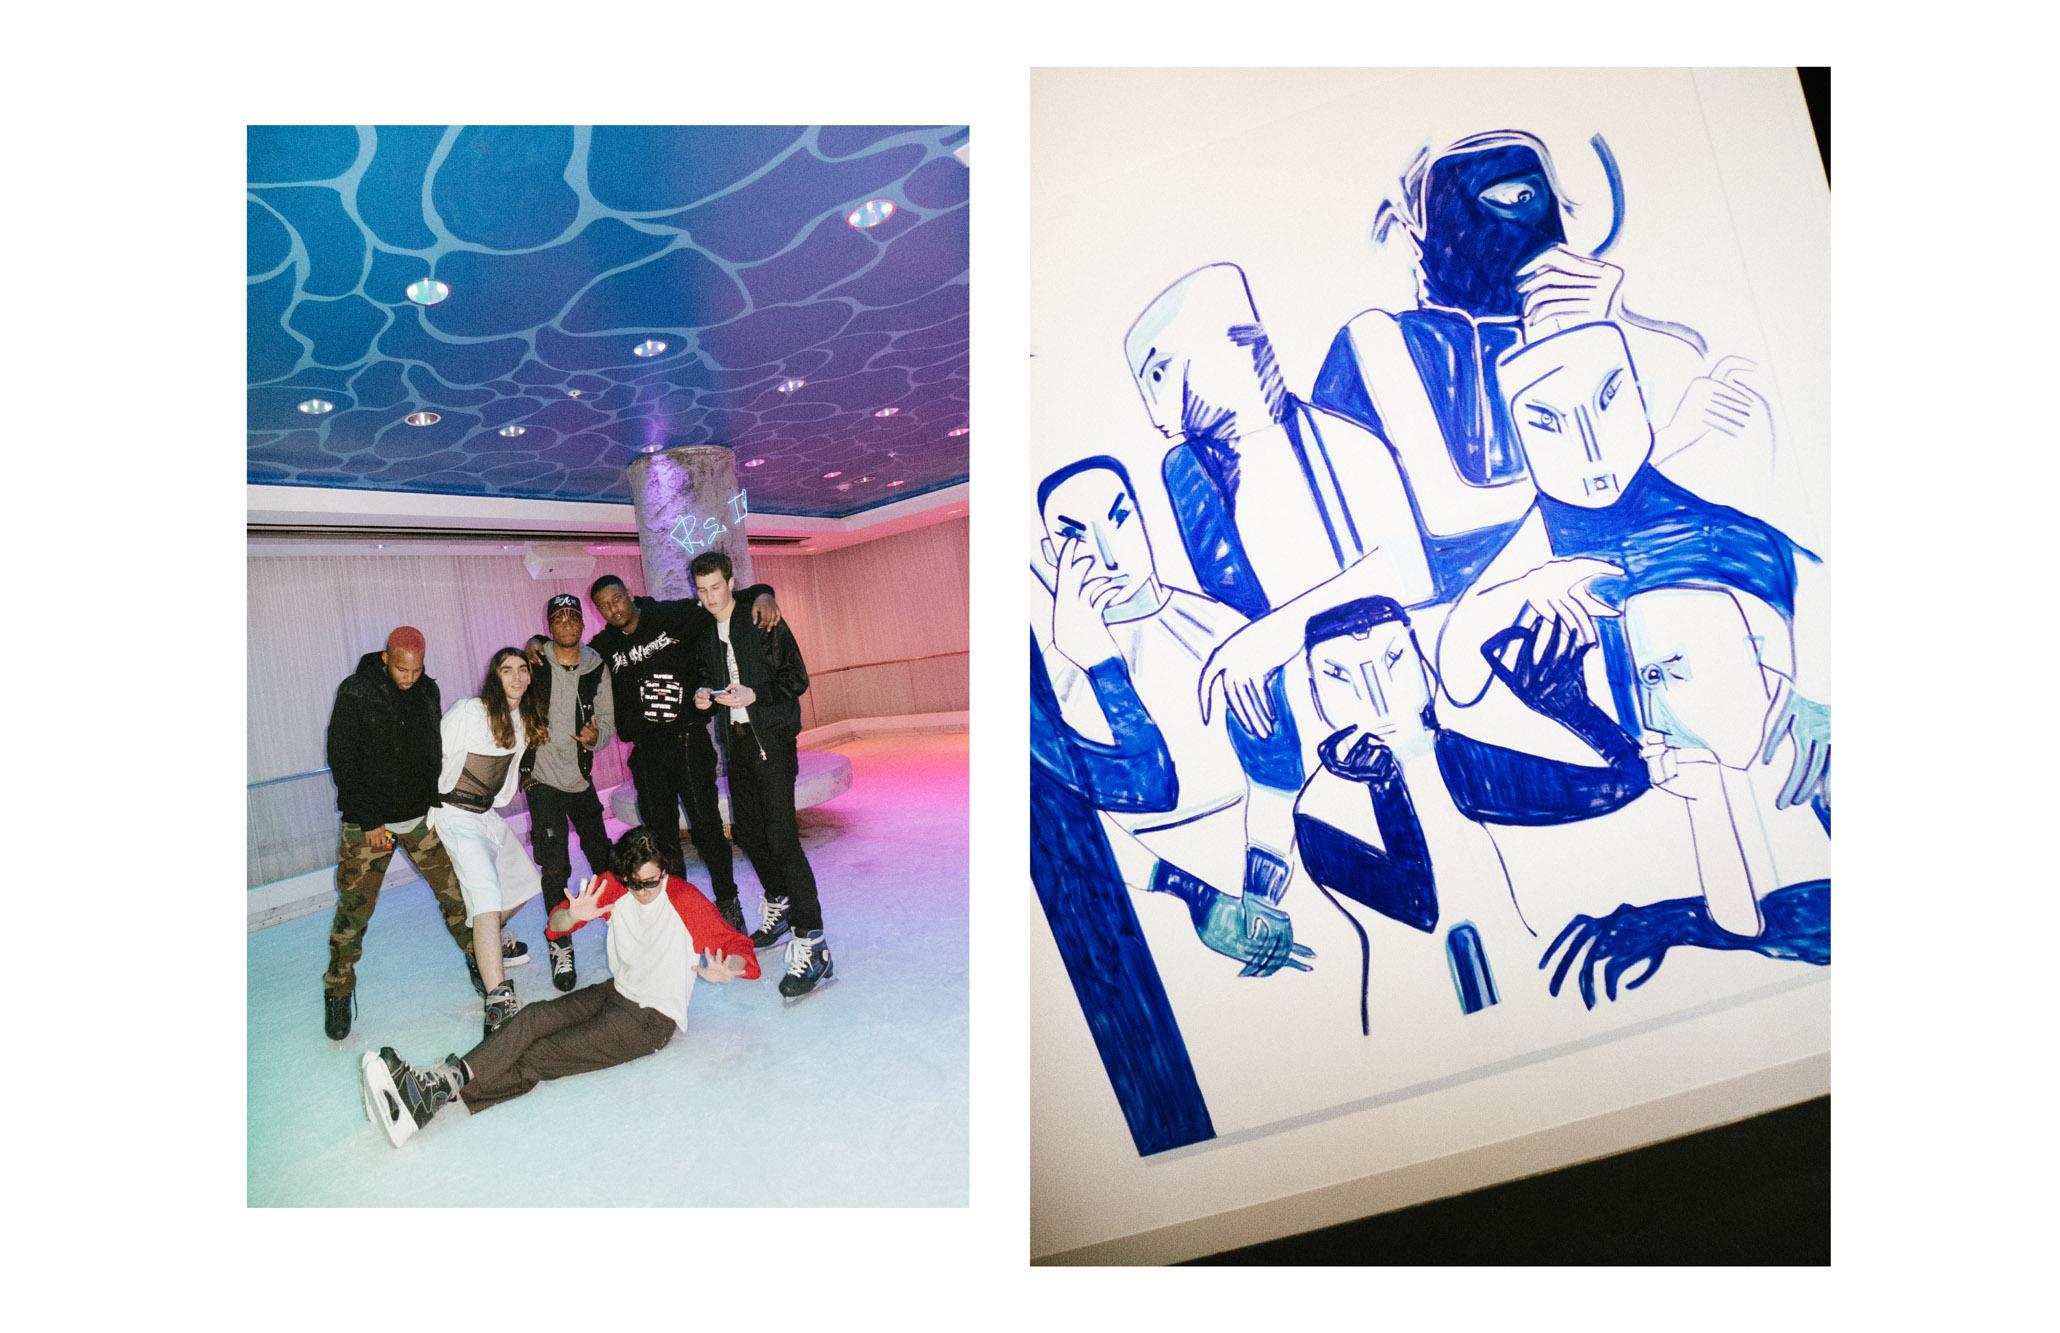 De gauche à droite :Teo No, Cyber69, KillCa$tro et Fiji deCMDWN, Jonah Levine et Gianni Mora.